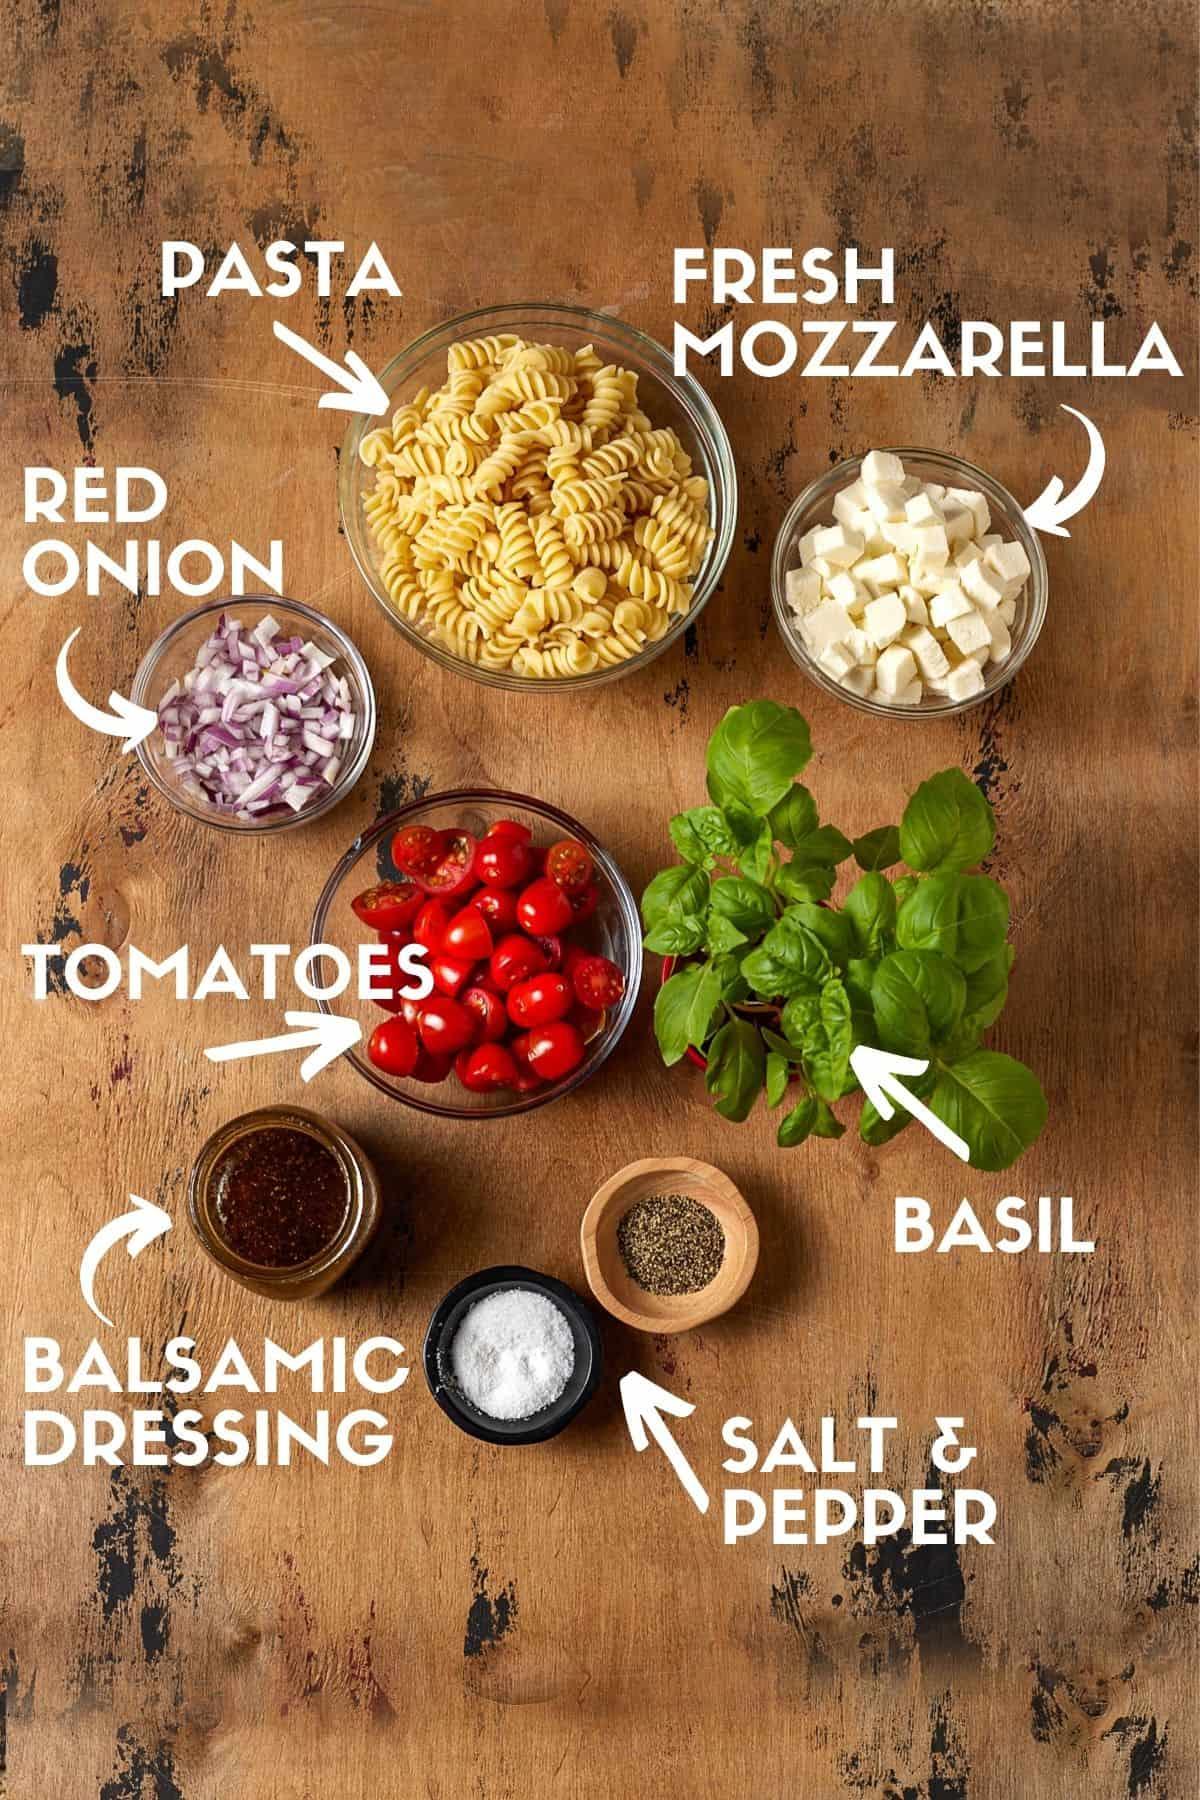 ingredients for pasta salad.